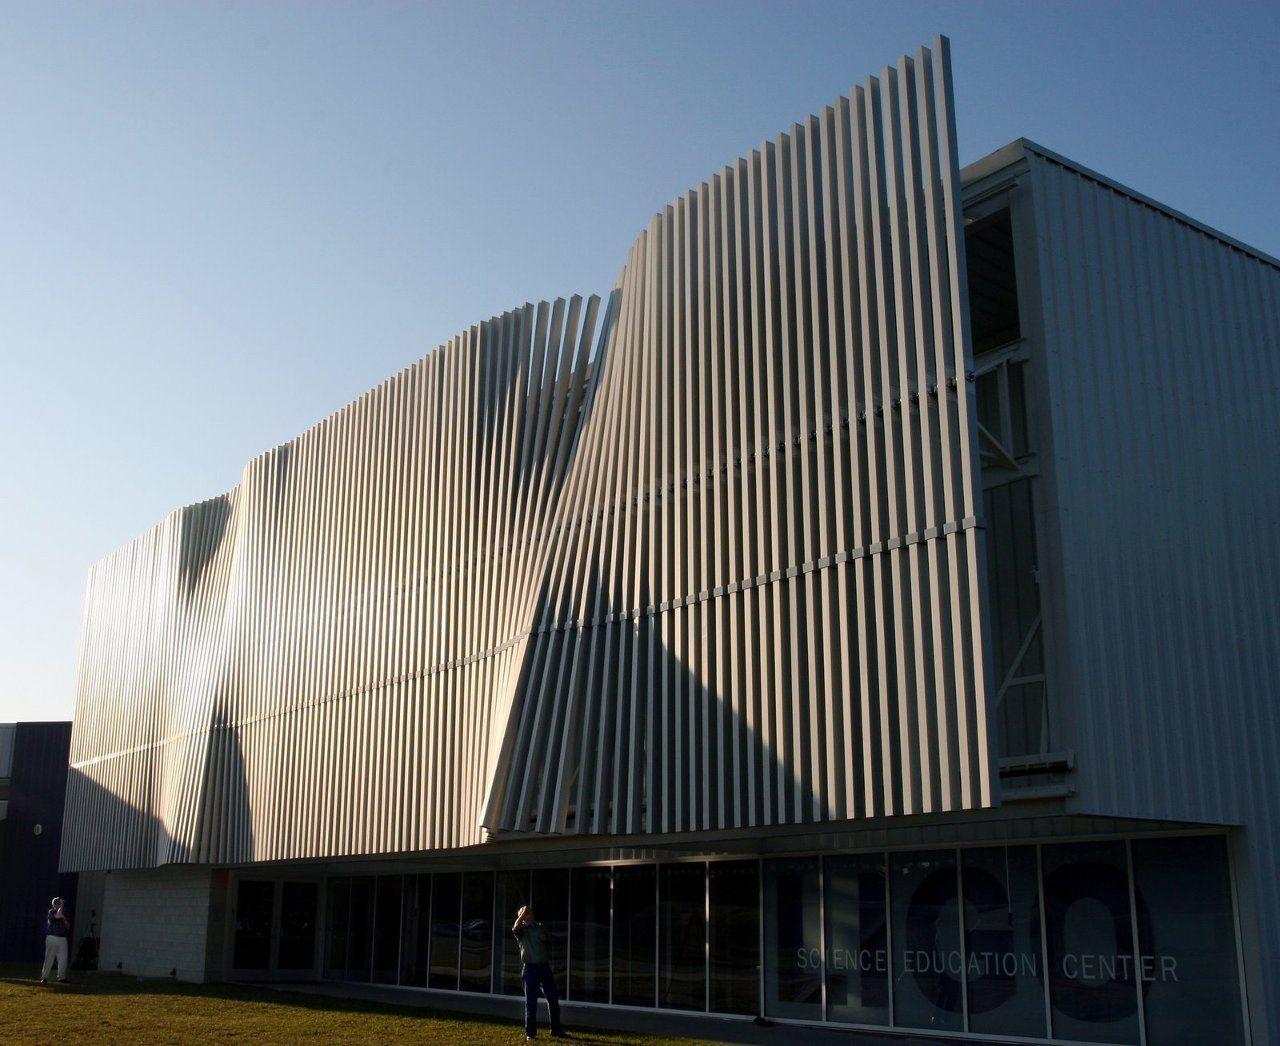 elevation facade material - Google Search | Favoritos 2016